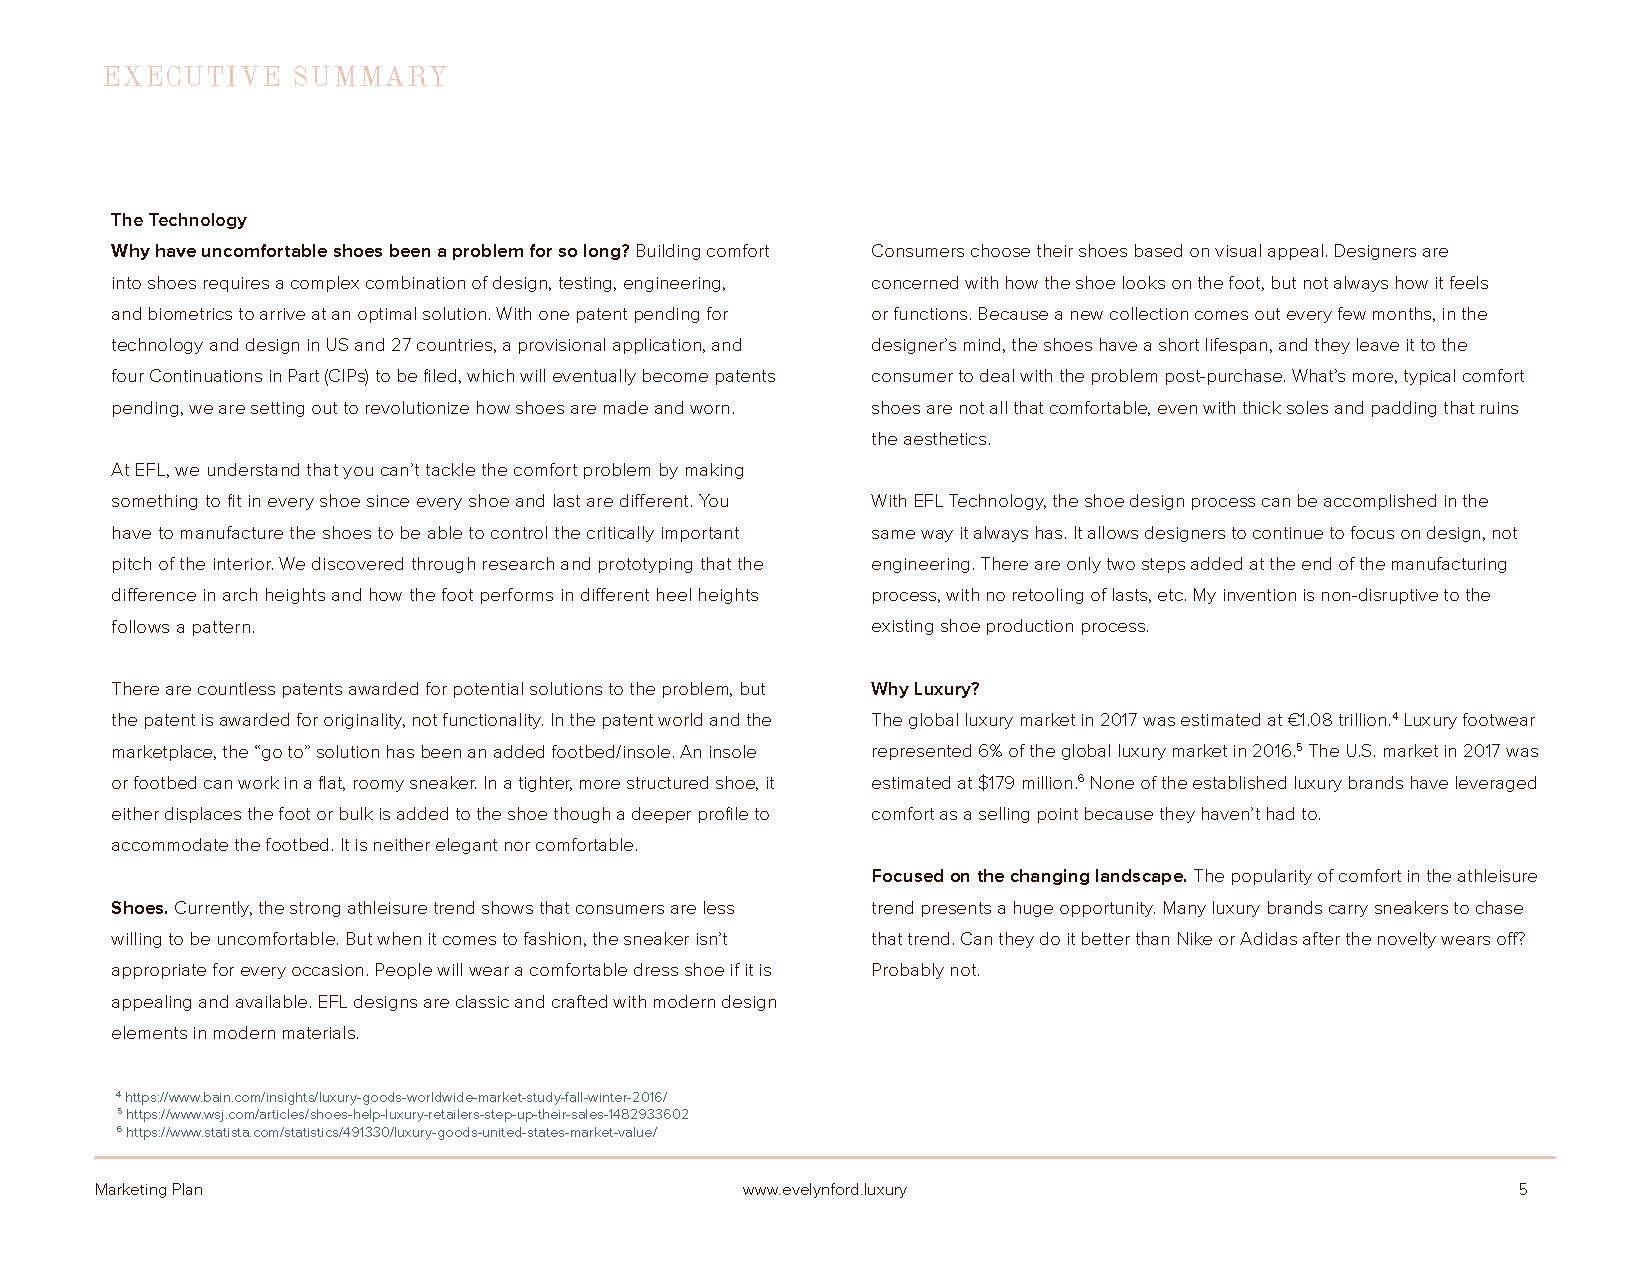 EFL_Marketing_Plan_110118_Page_05.jpg